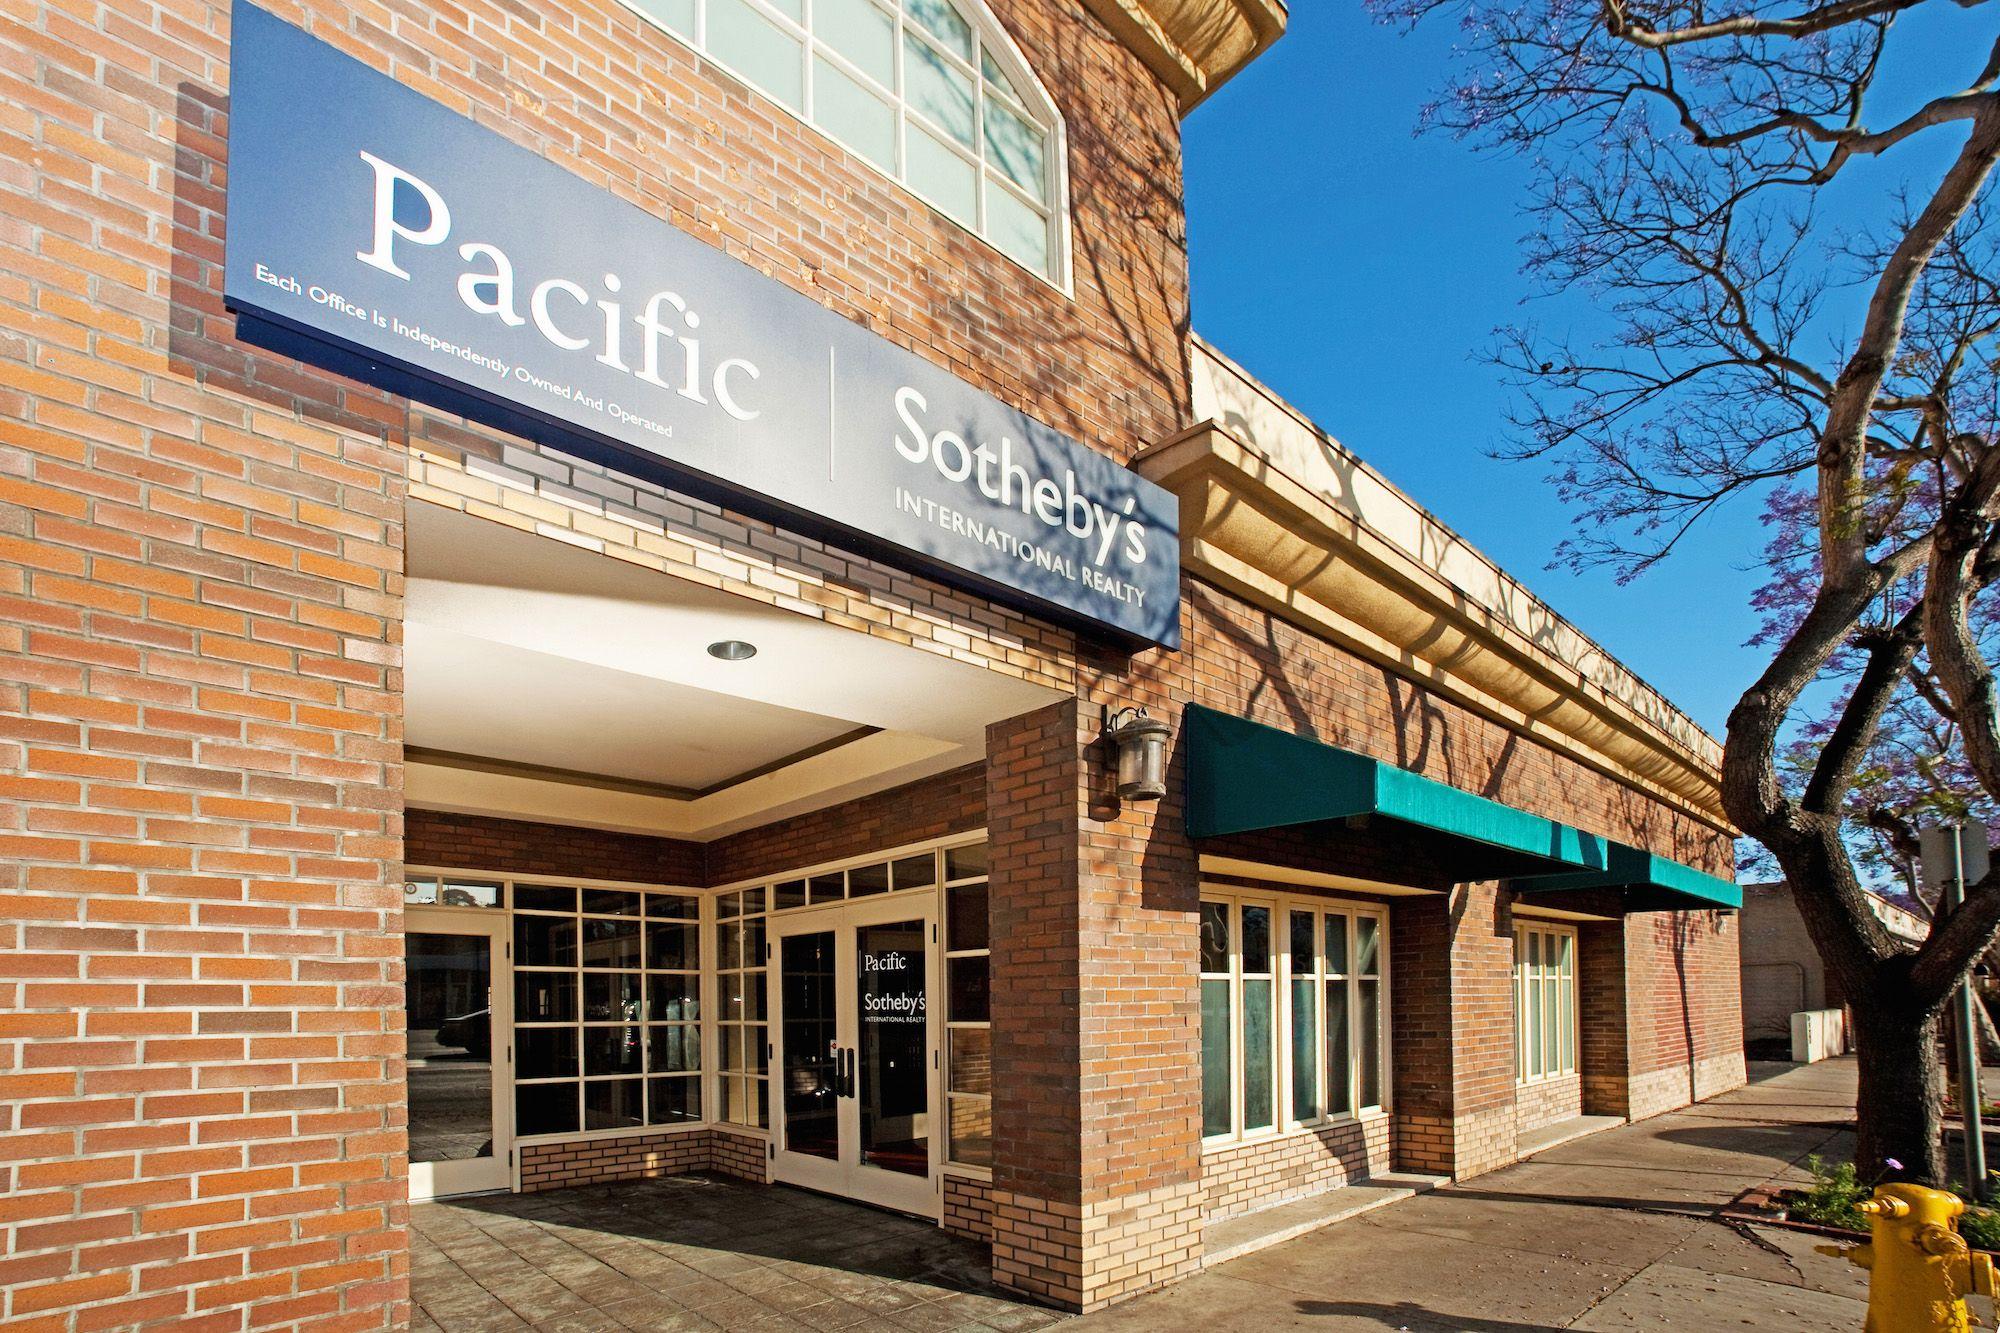 Point Loma - Rosecrans   1075 Rosecrans Street  San Diego, California 92106  619.516.8895  Languages: English